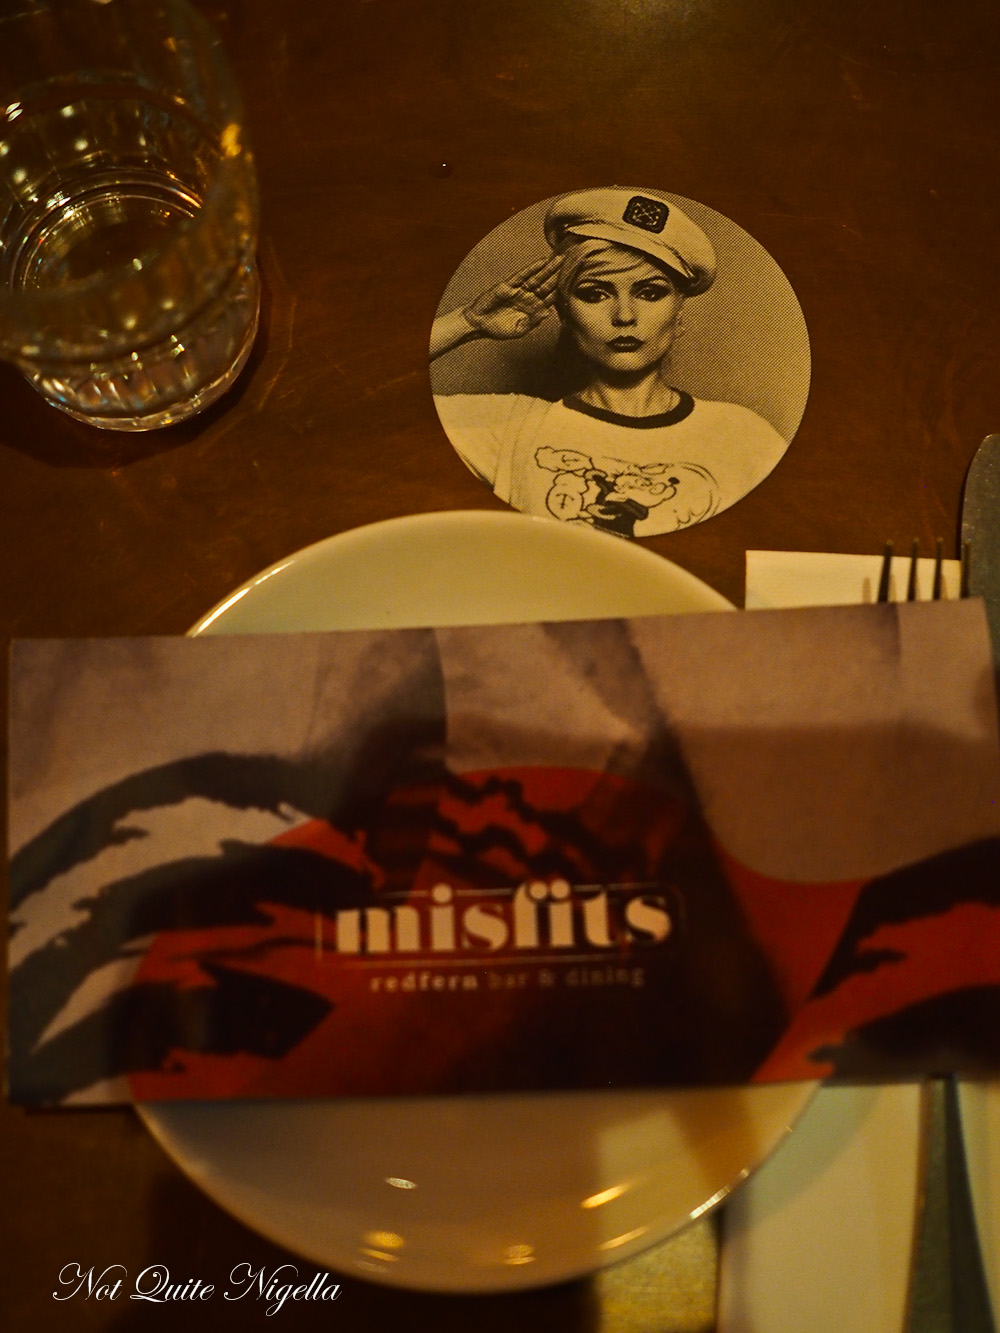 Misfits Redfern